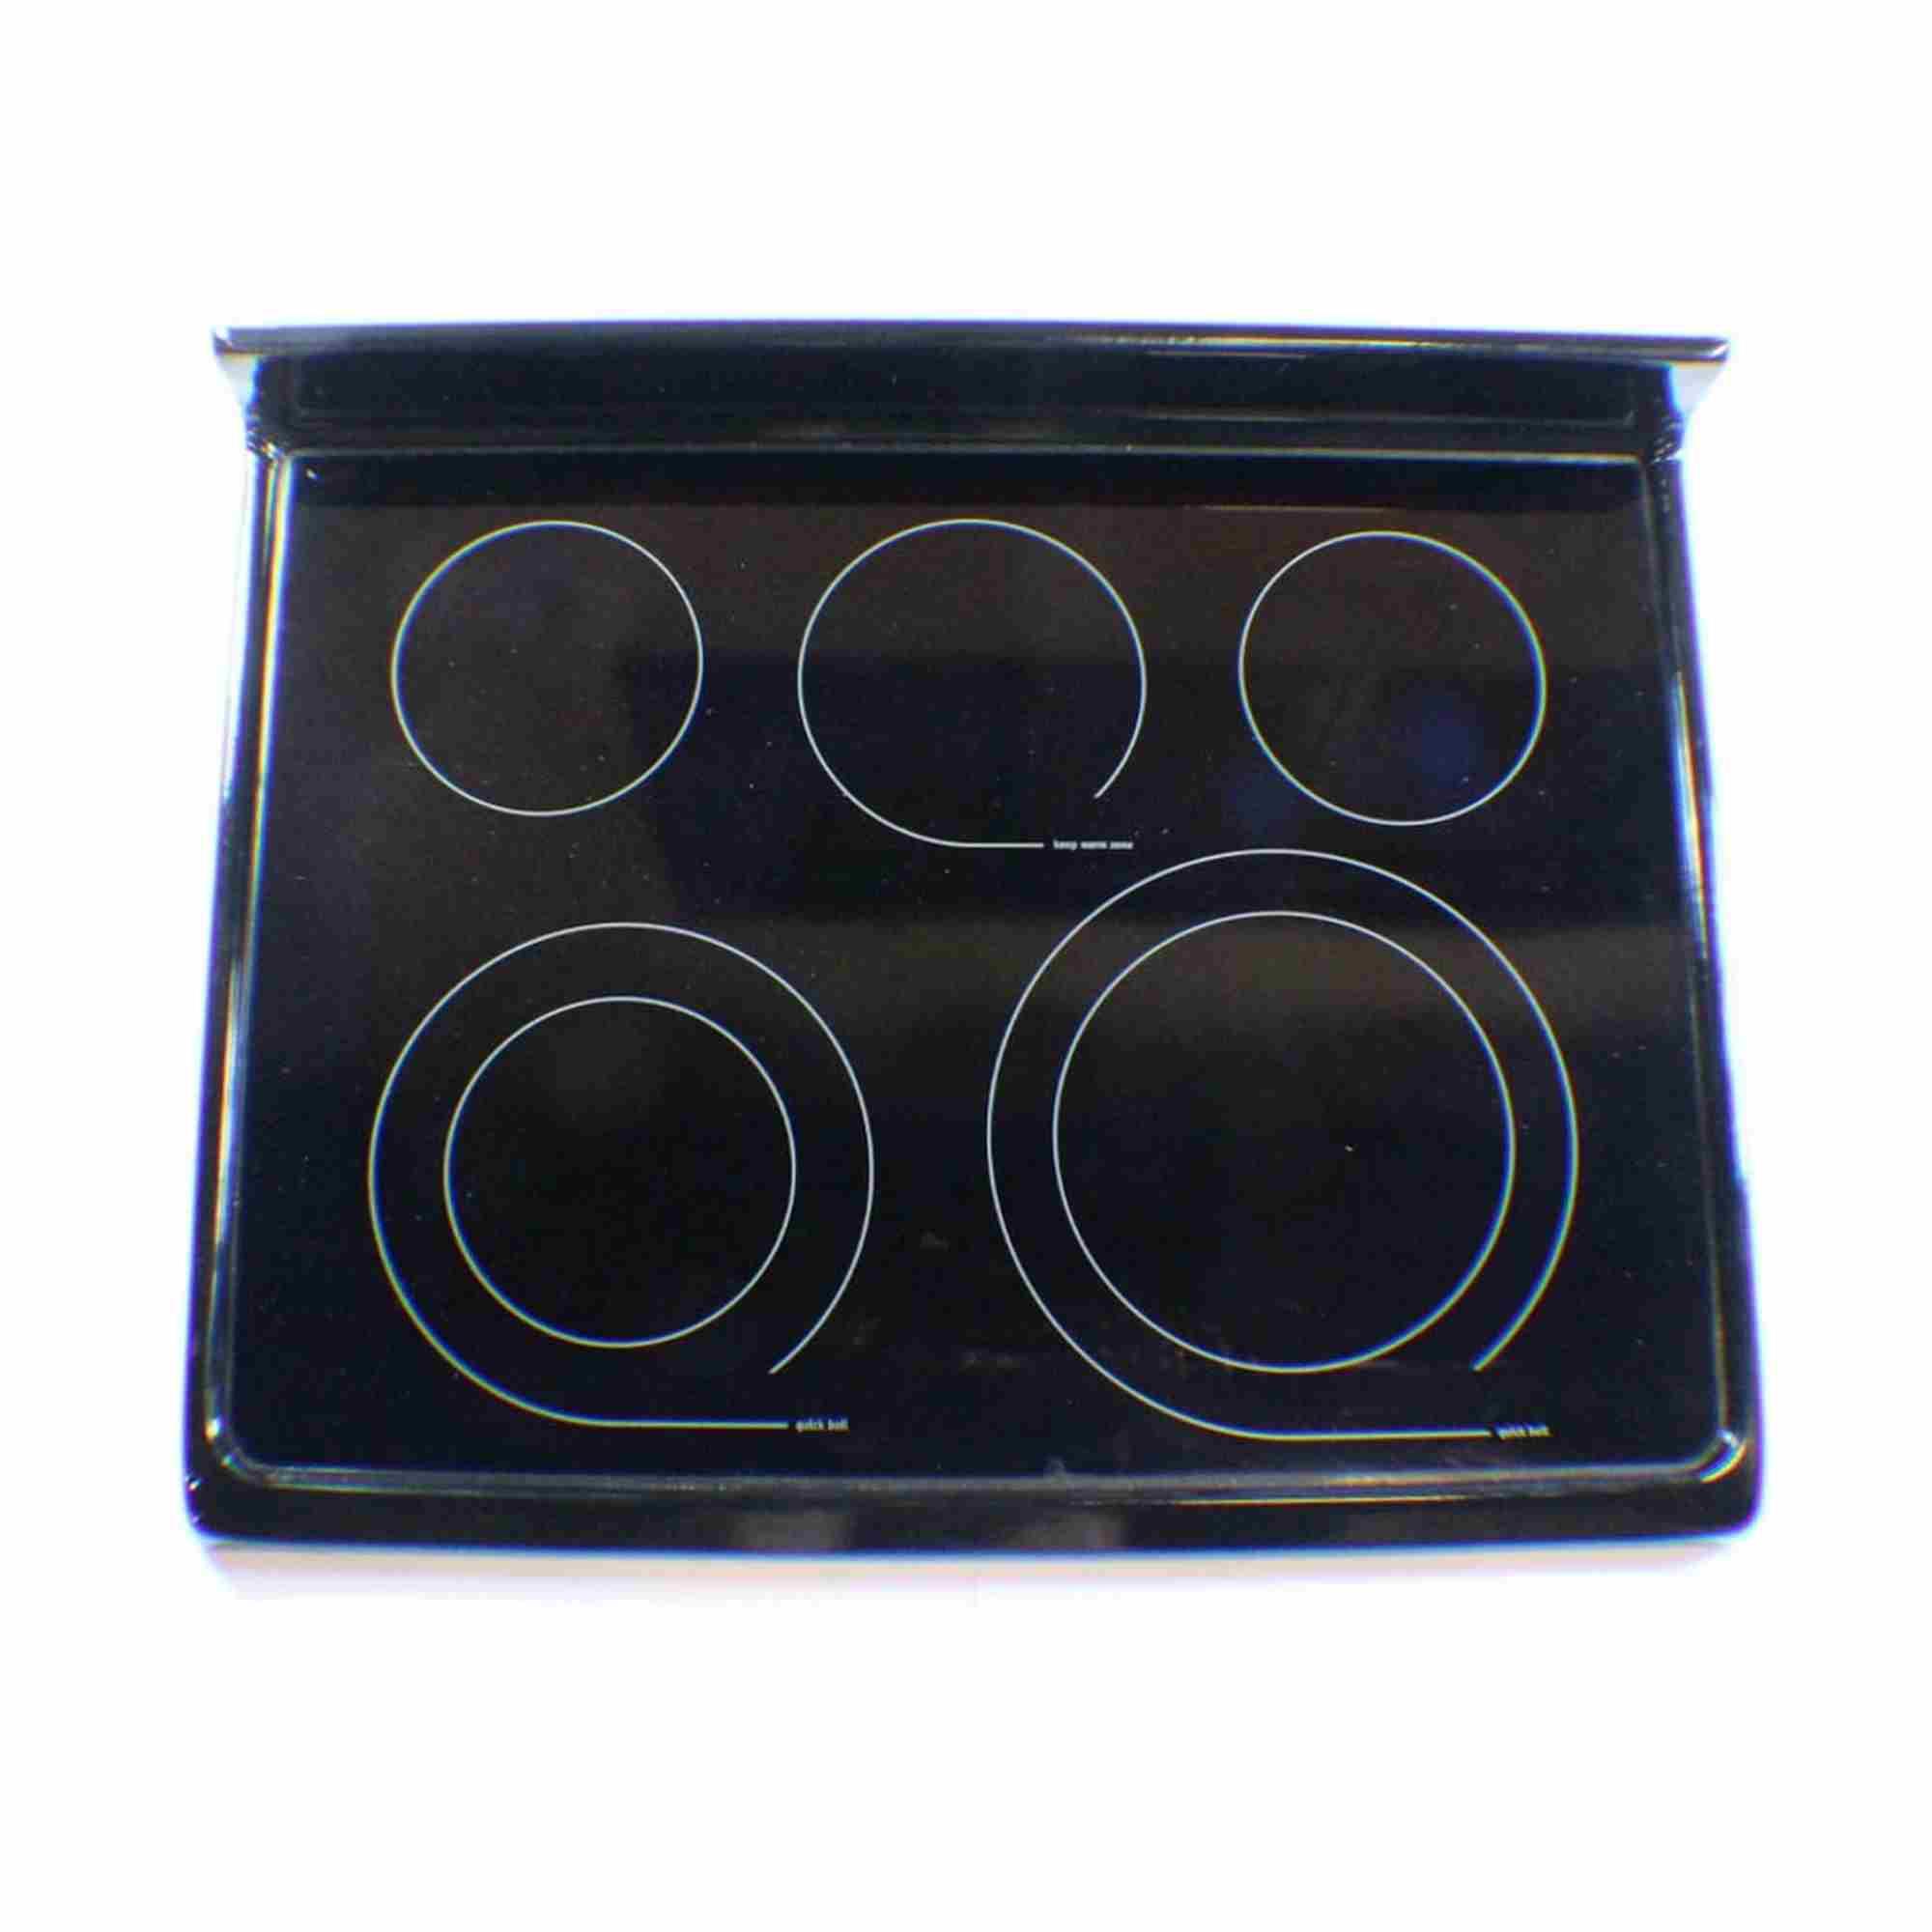 316531960 for frigidaire range glass cooktop ebay